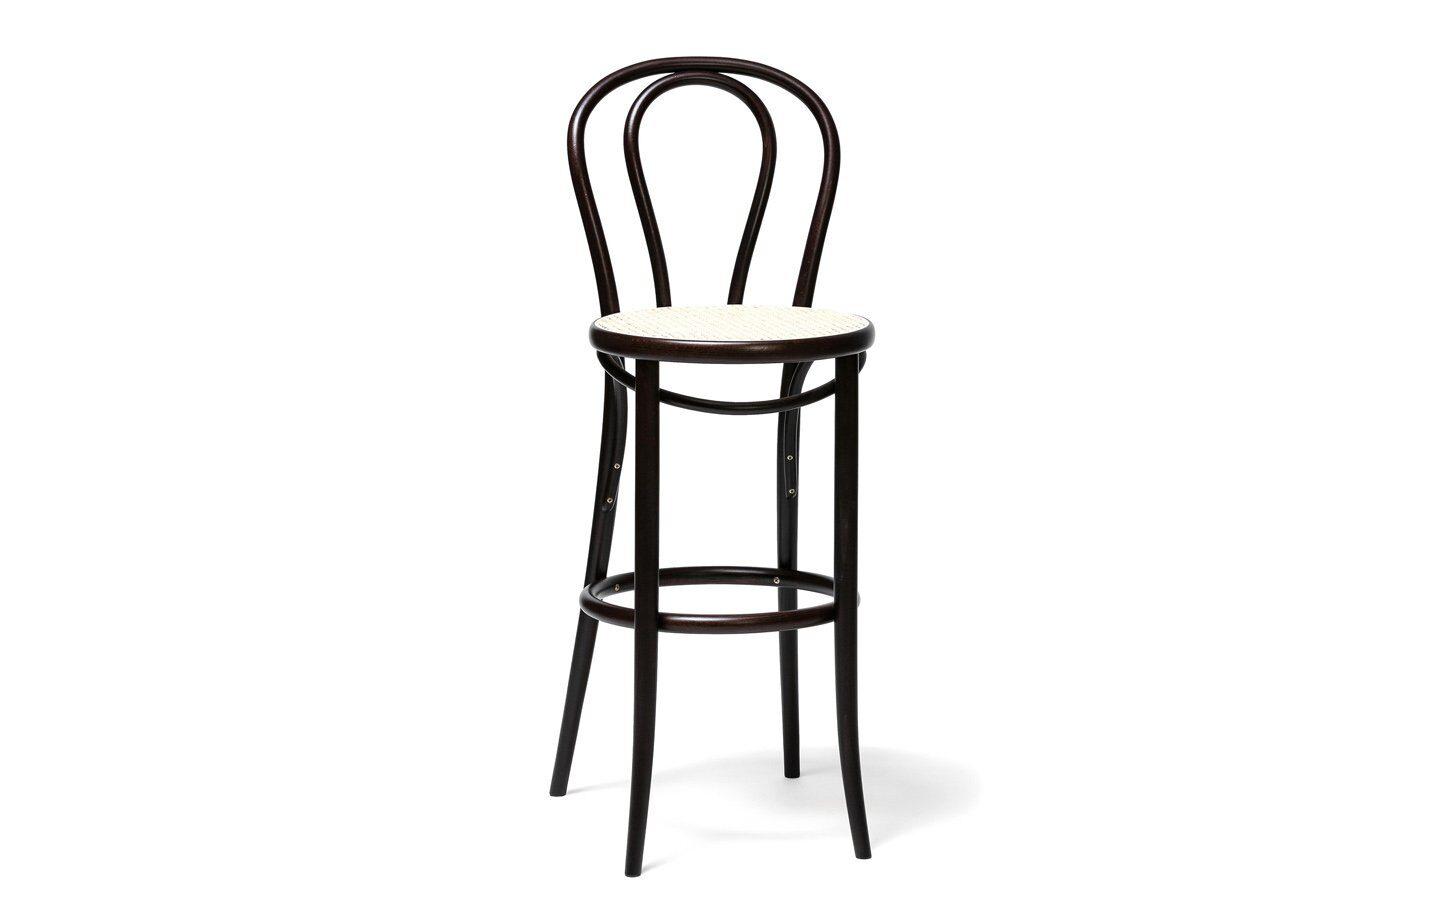 18-Barstool-Bent-wood-Cane-seat-Ton-01